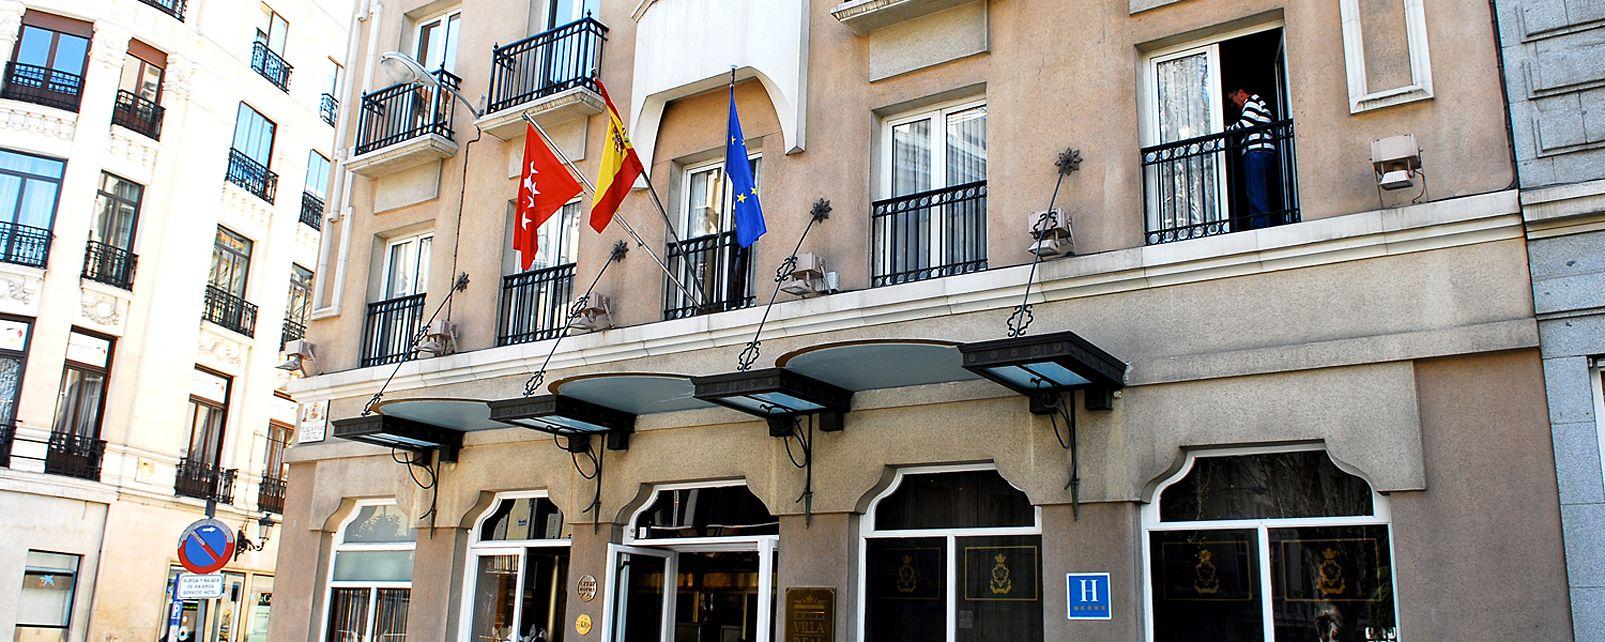 هتل ویلا رئال بارسلون